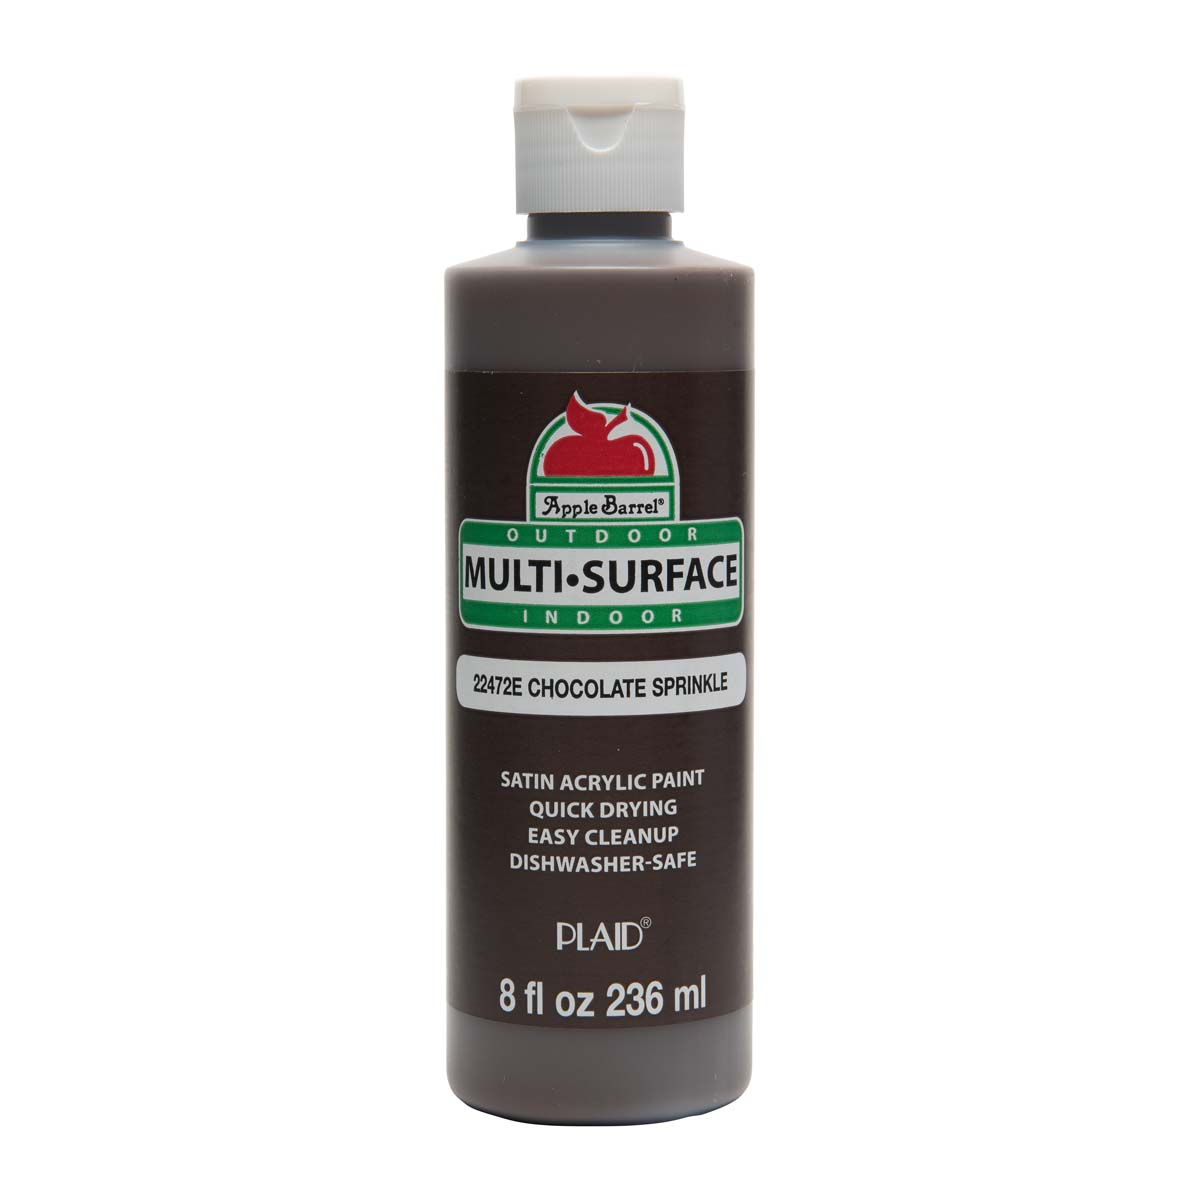 Apple Barrel ® Multi-Surface Satin Acrylic Paints - Chocolate Sprinkle, 8 oz. - 22472E